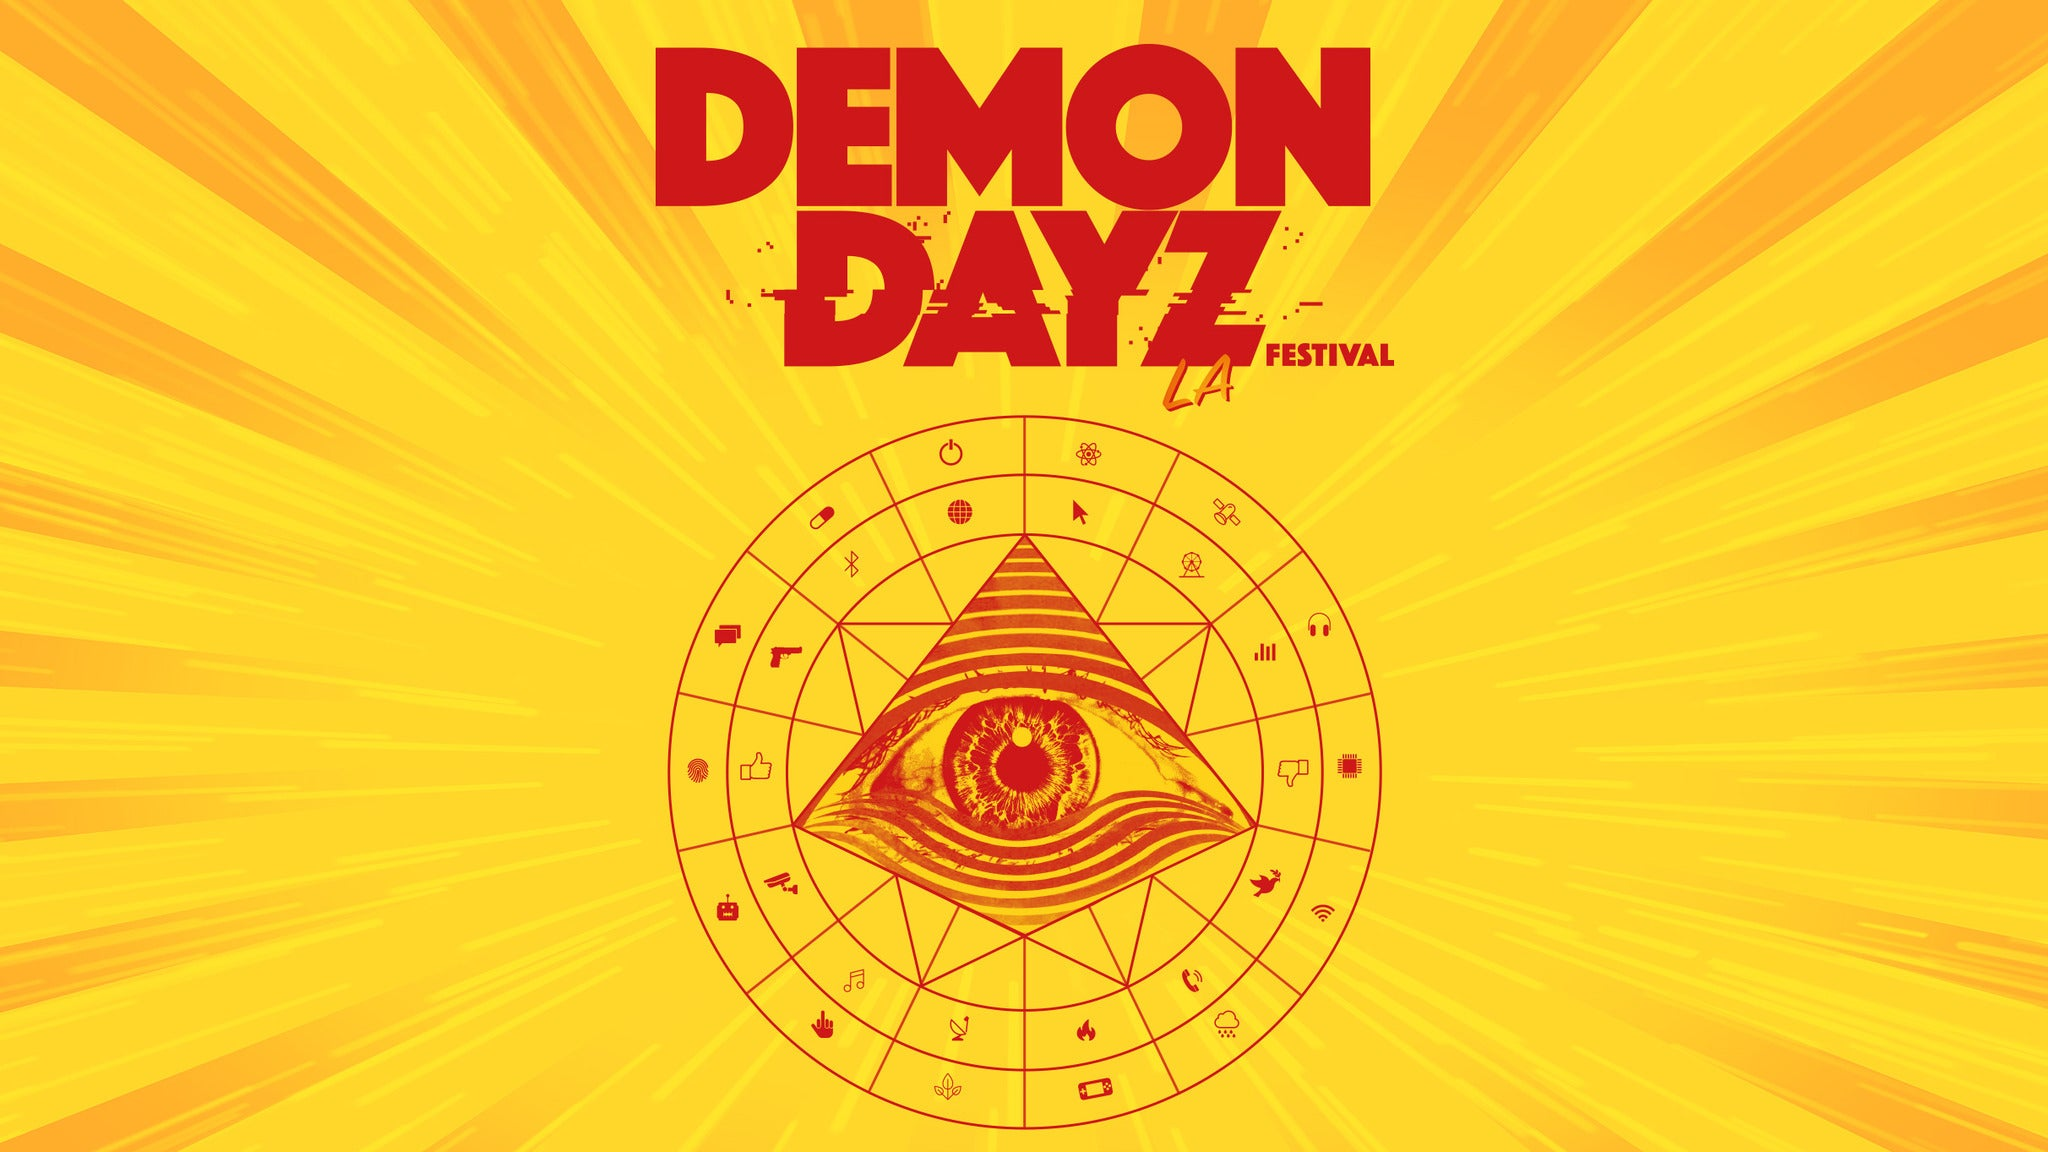 Gorillaz Demon Dayz Festival at Pico Rivera Sports Arena